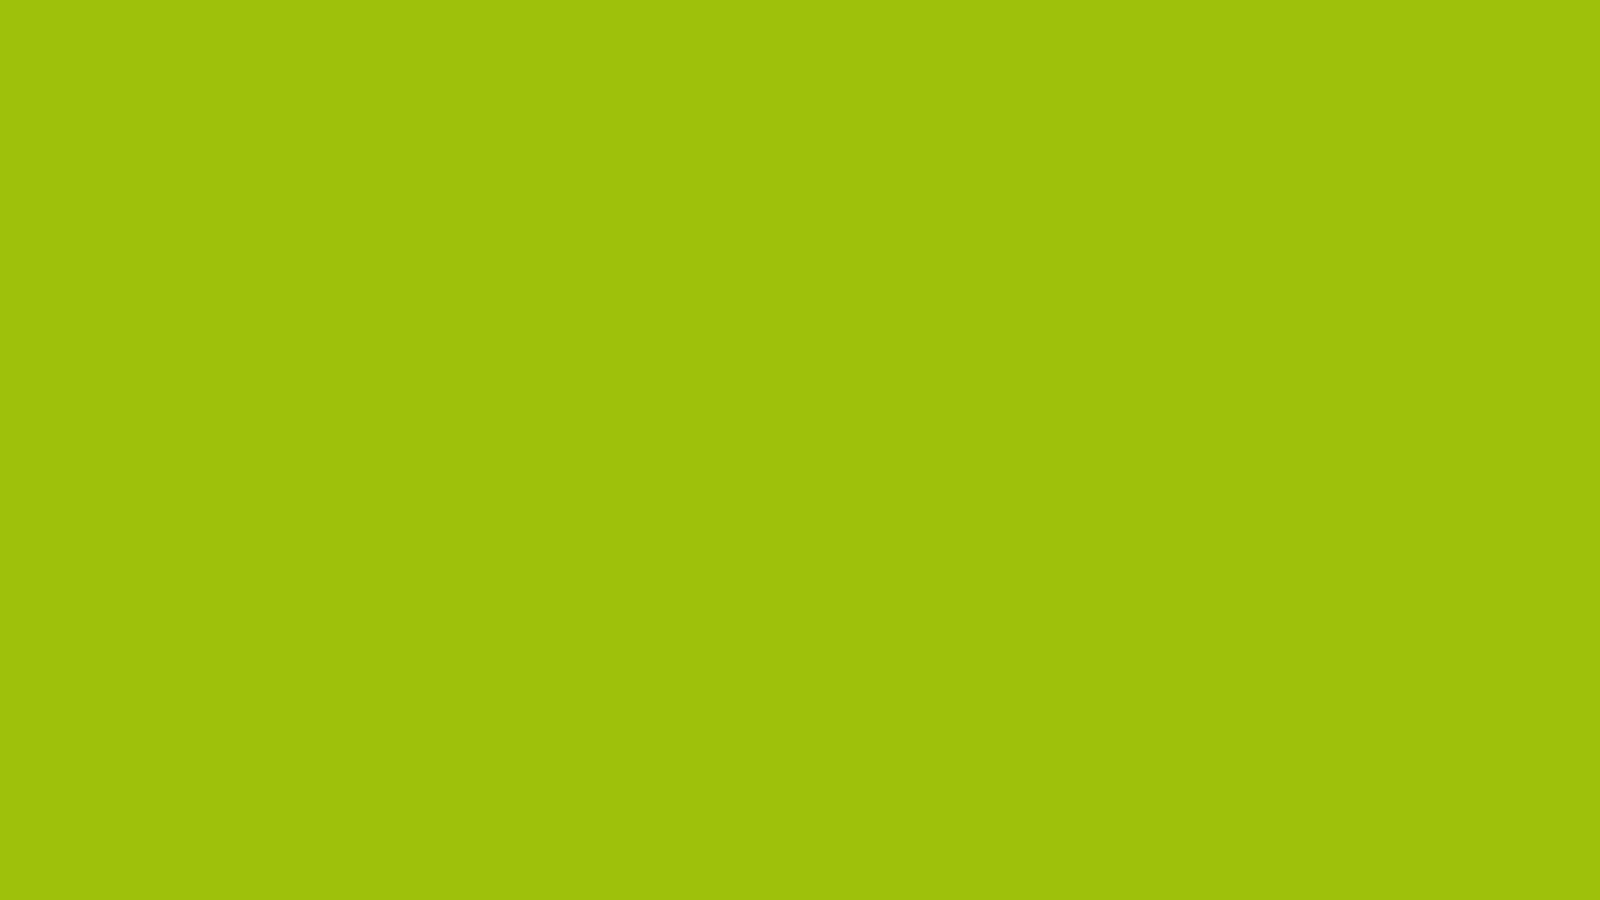 1600x900 Limerick Solid Color Background